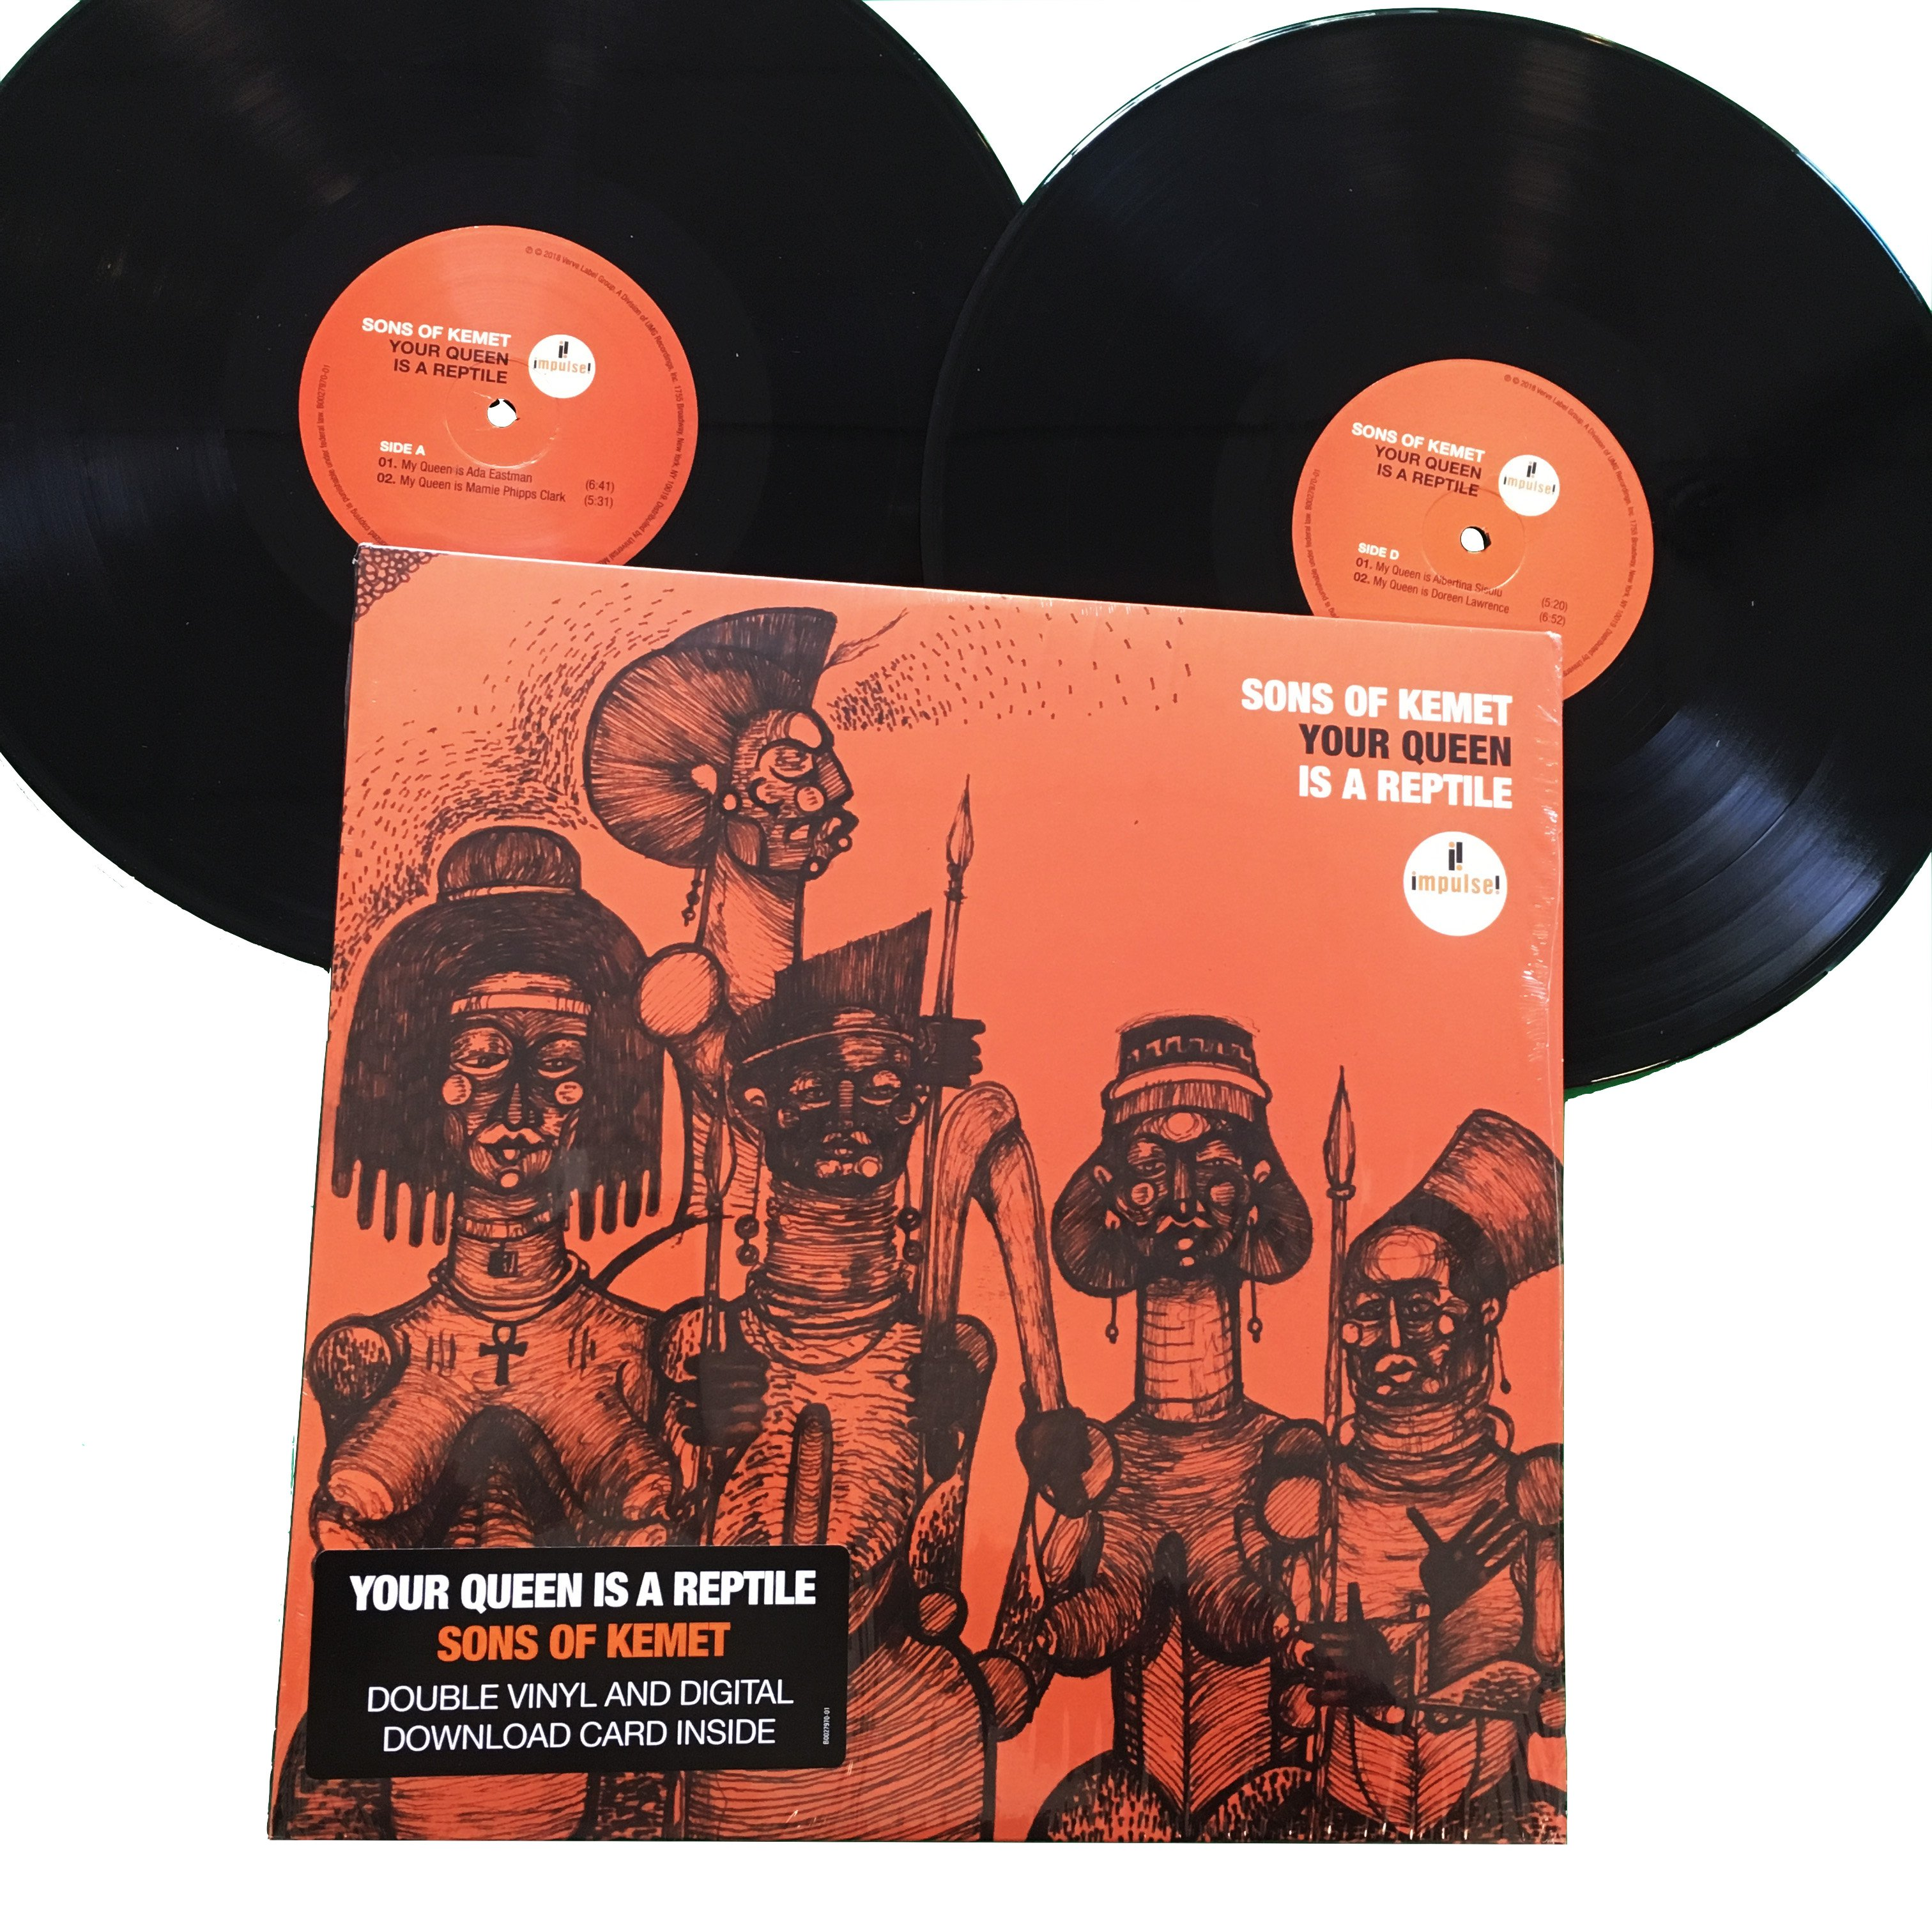 Theartsdesk On Vinyl 42 Flaming Lips Blacklab Juno